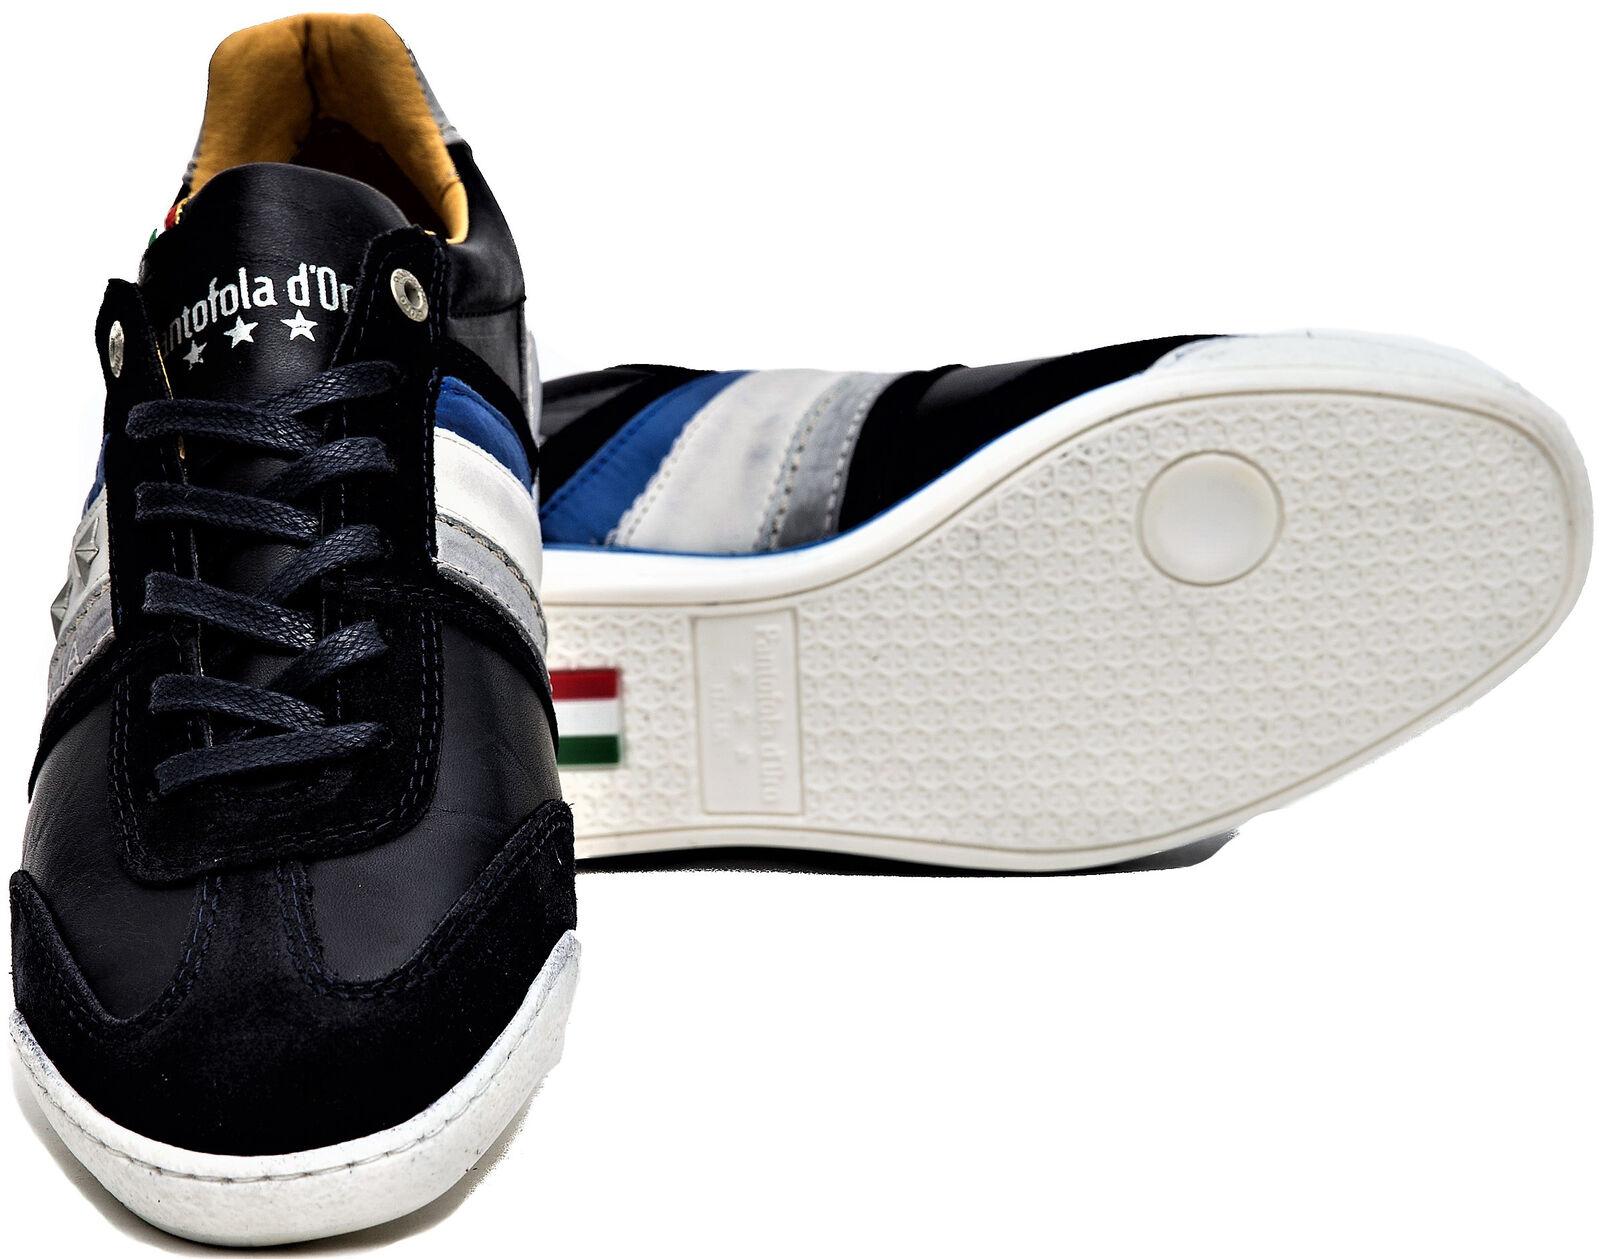 Uomo Blu Pantofola d'Oro Low Shoes Uomo Blue Imola Low d'Oro c4c38b